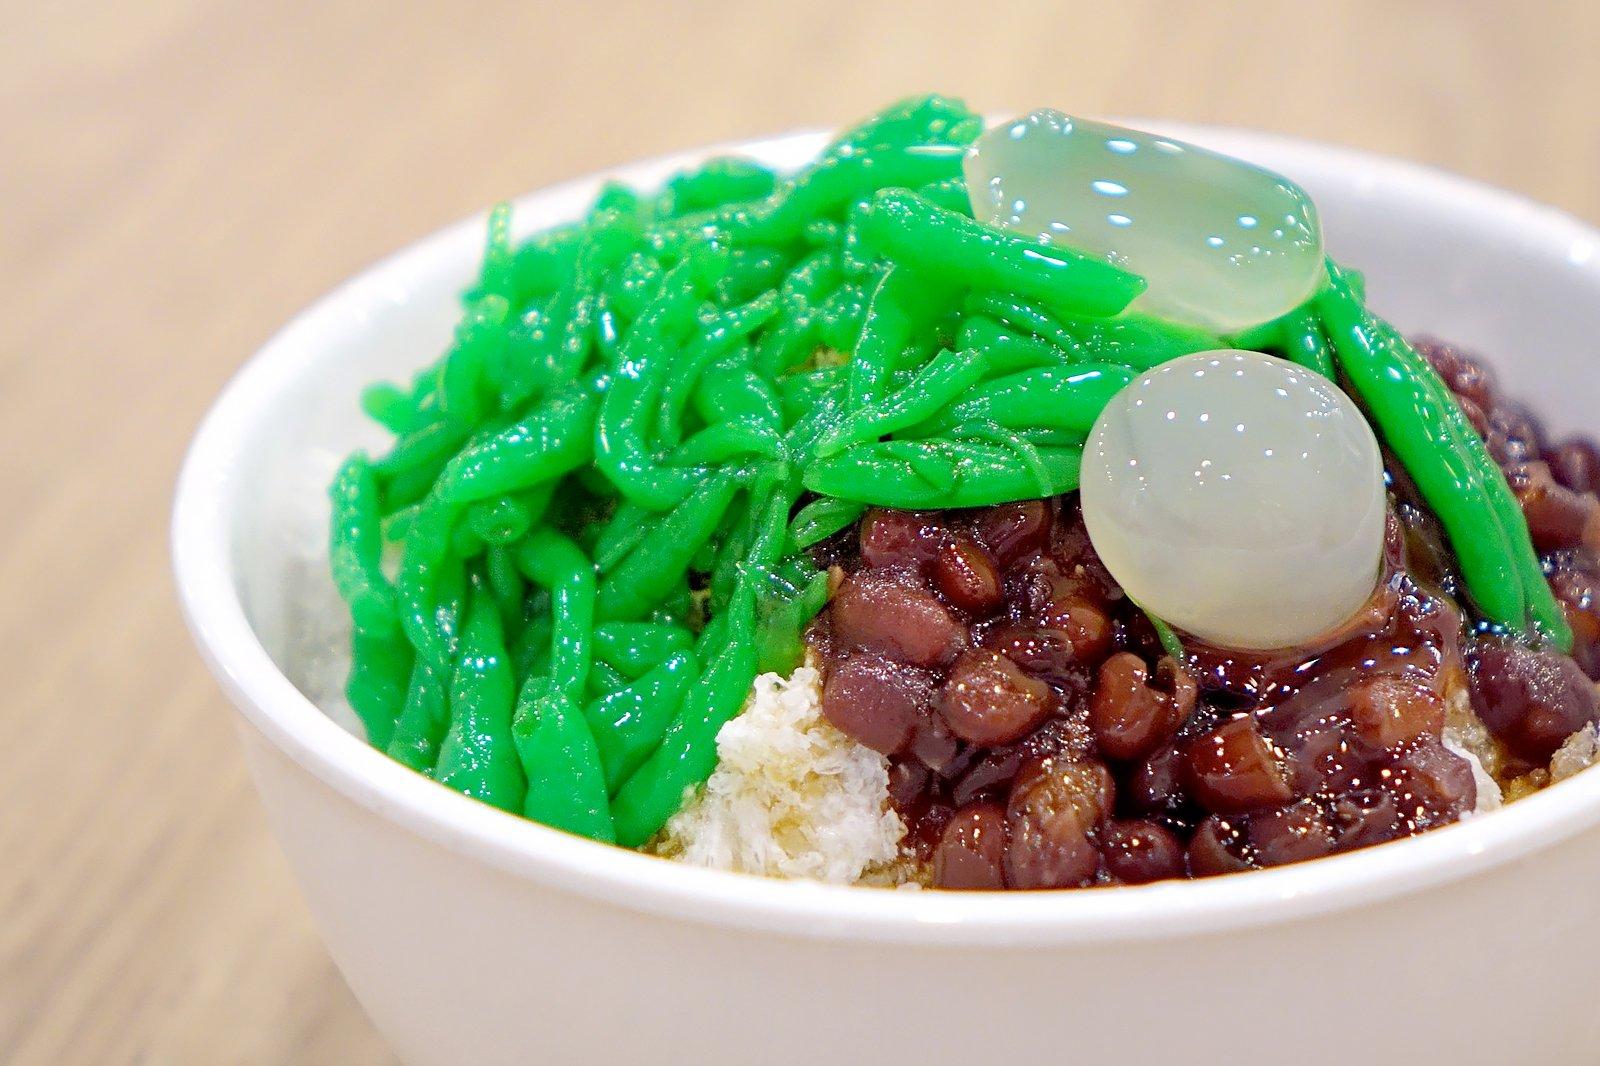 15 Best Singaporean Foods E53ad67c-07cc-4bf7-9a1a-36a9495f5af5